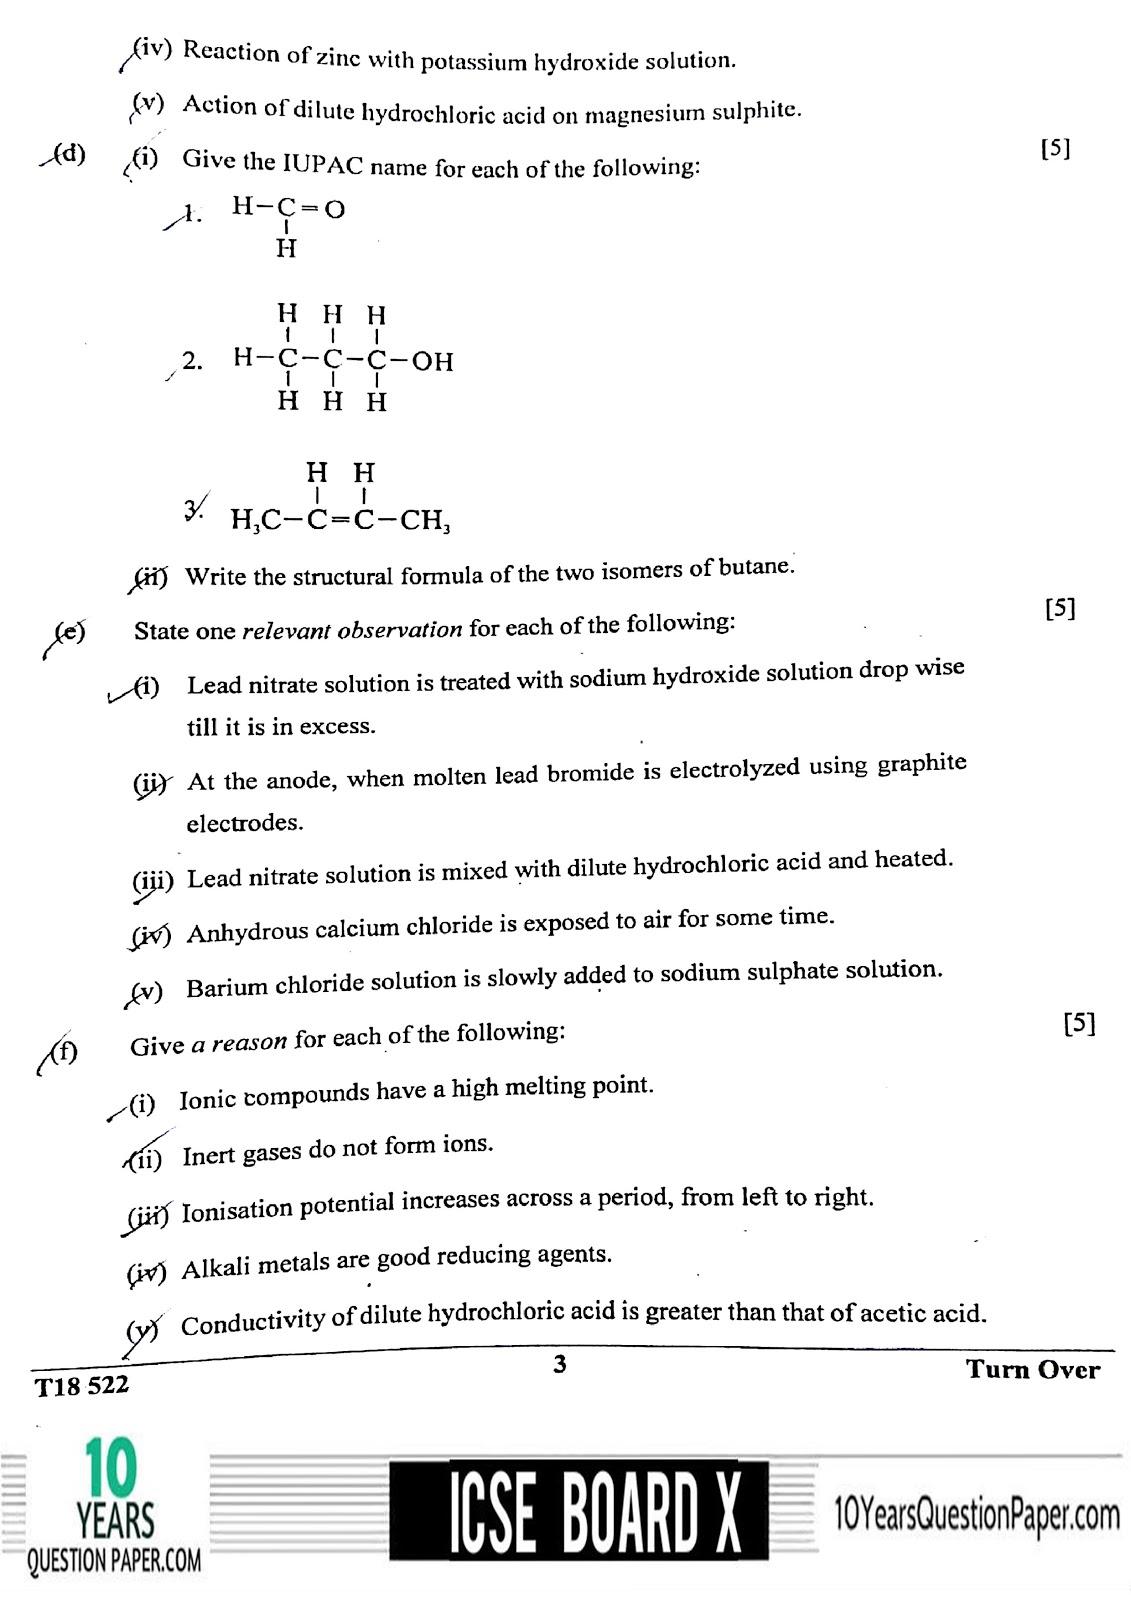 ICSE Class 10 Chemistry 2018 Question Paper